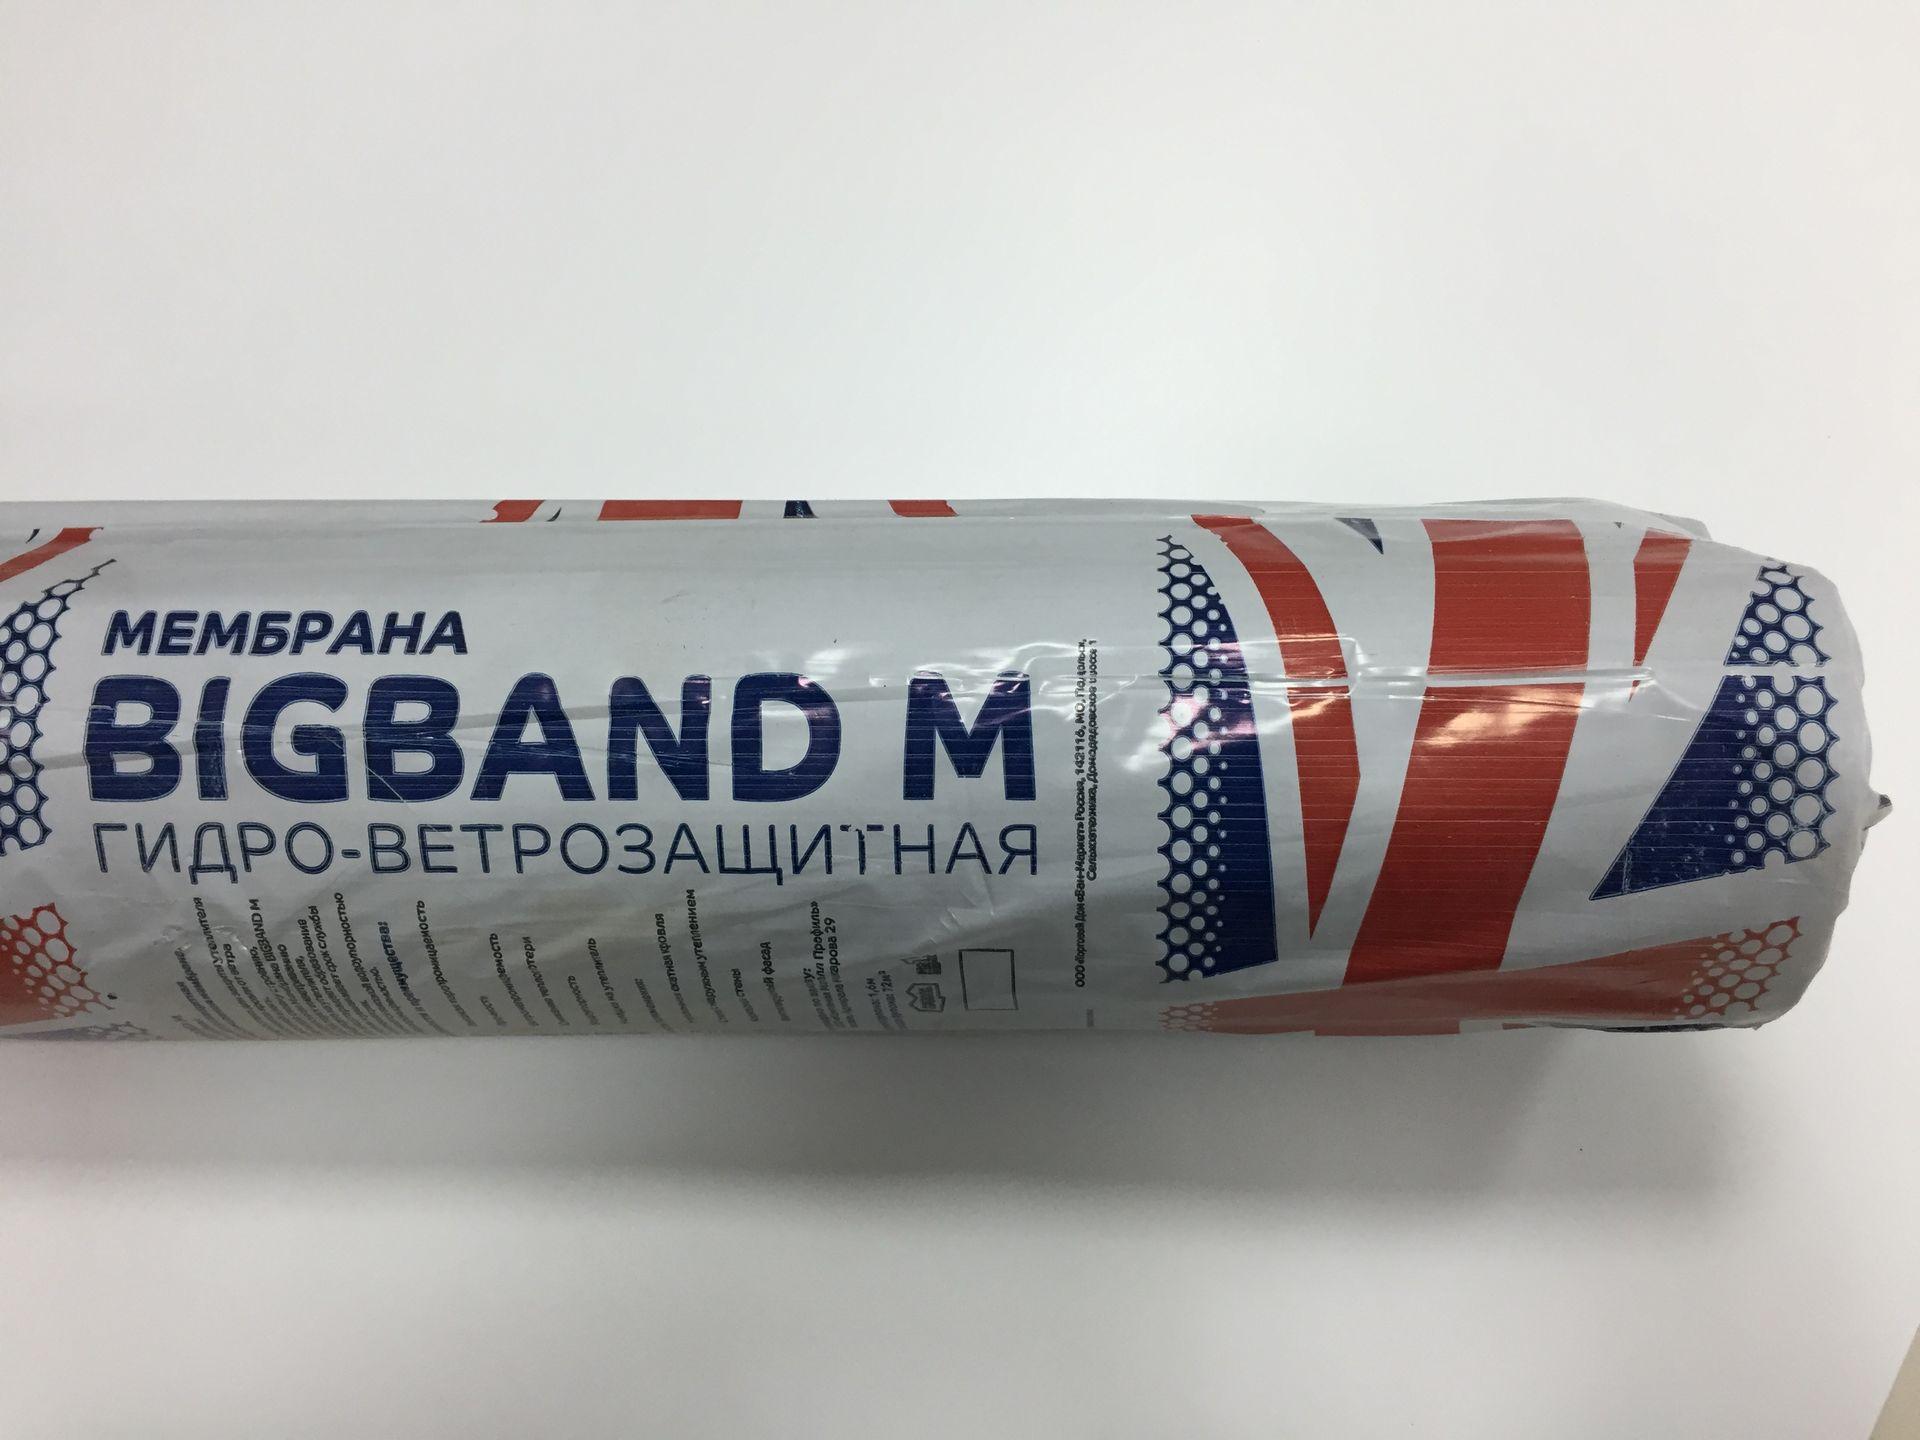 Мембрана гидро-ветрозащитная паропроницаемая BIGBAND М